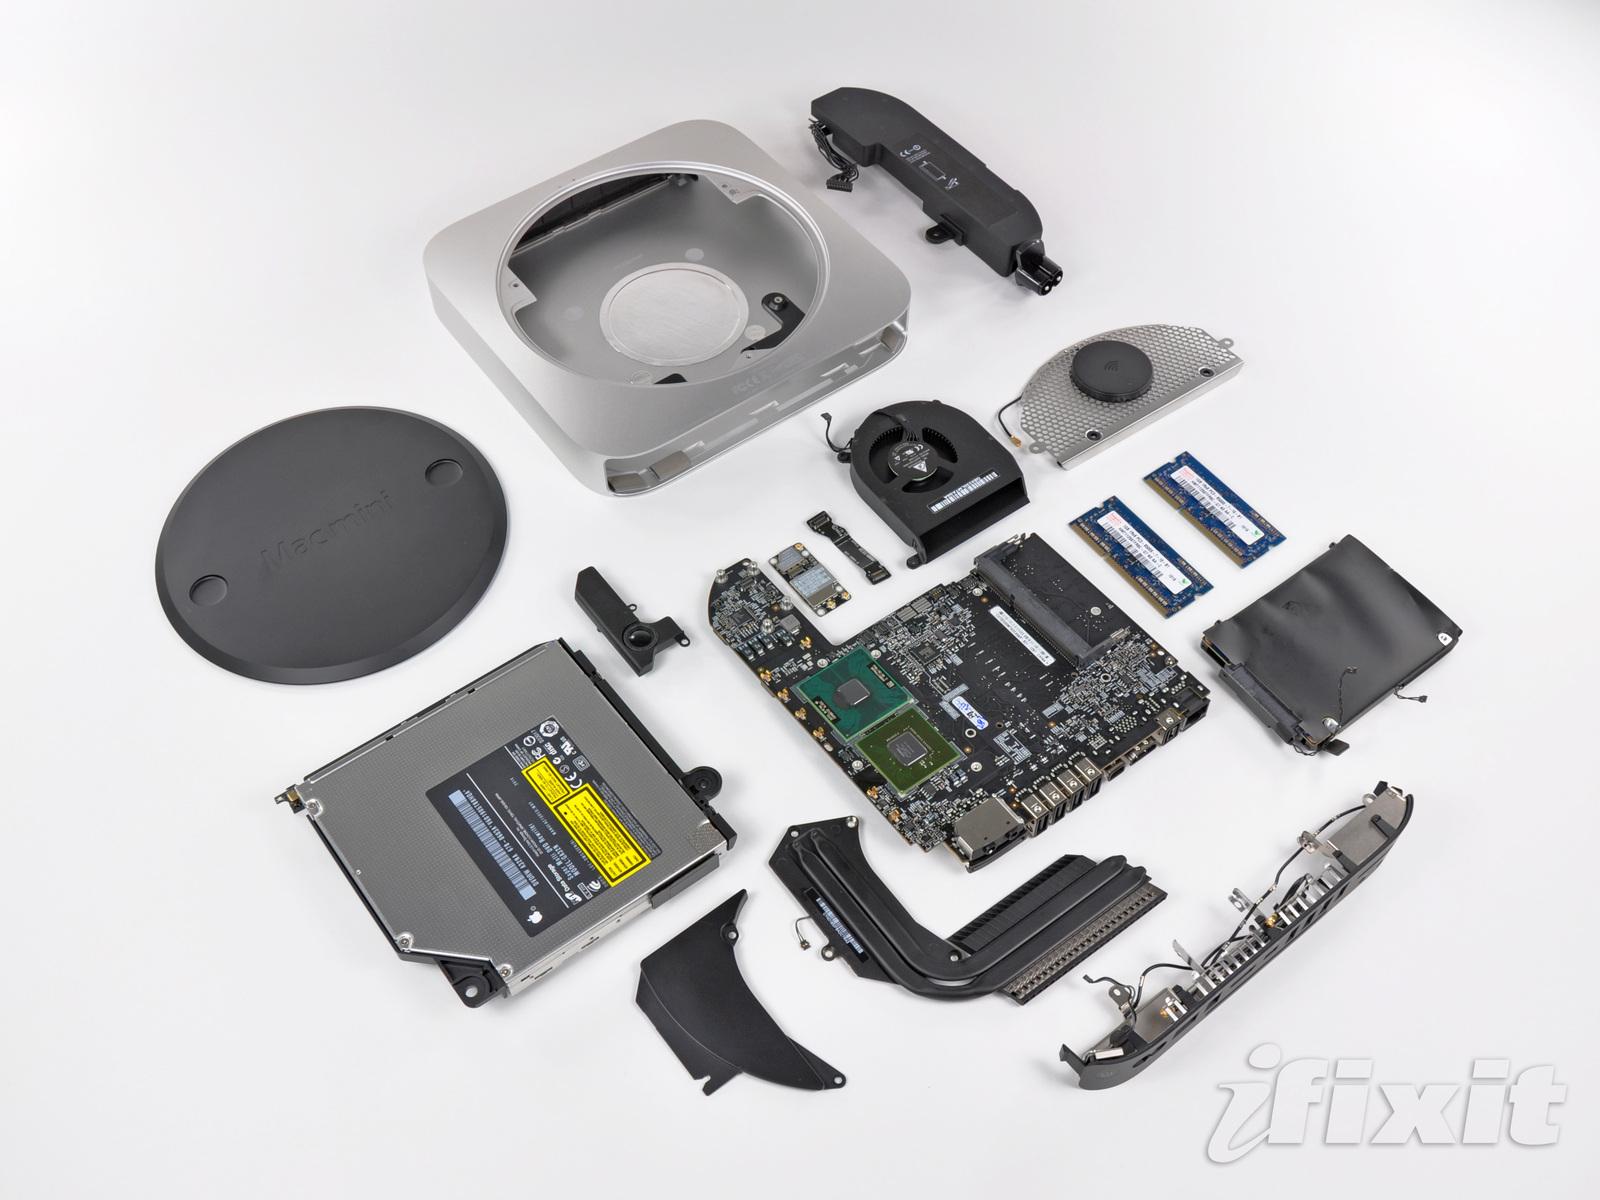 Novo Mac mini desmontado pela iFixit